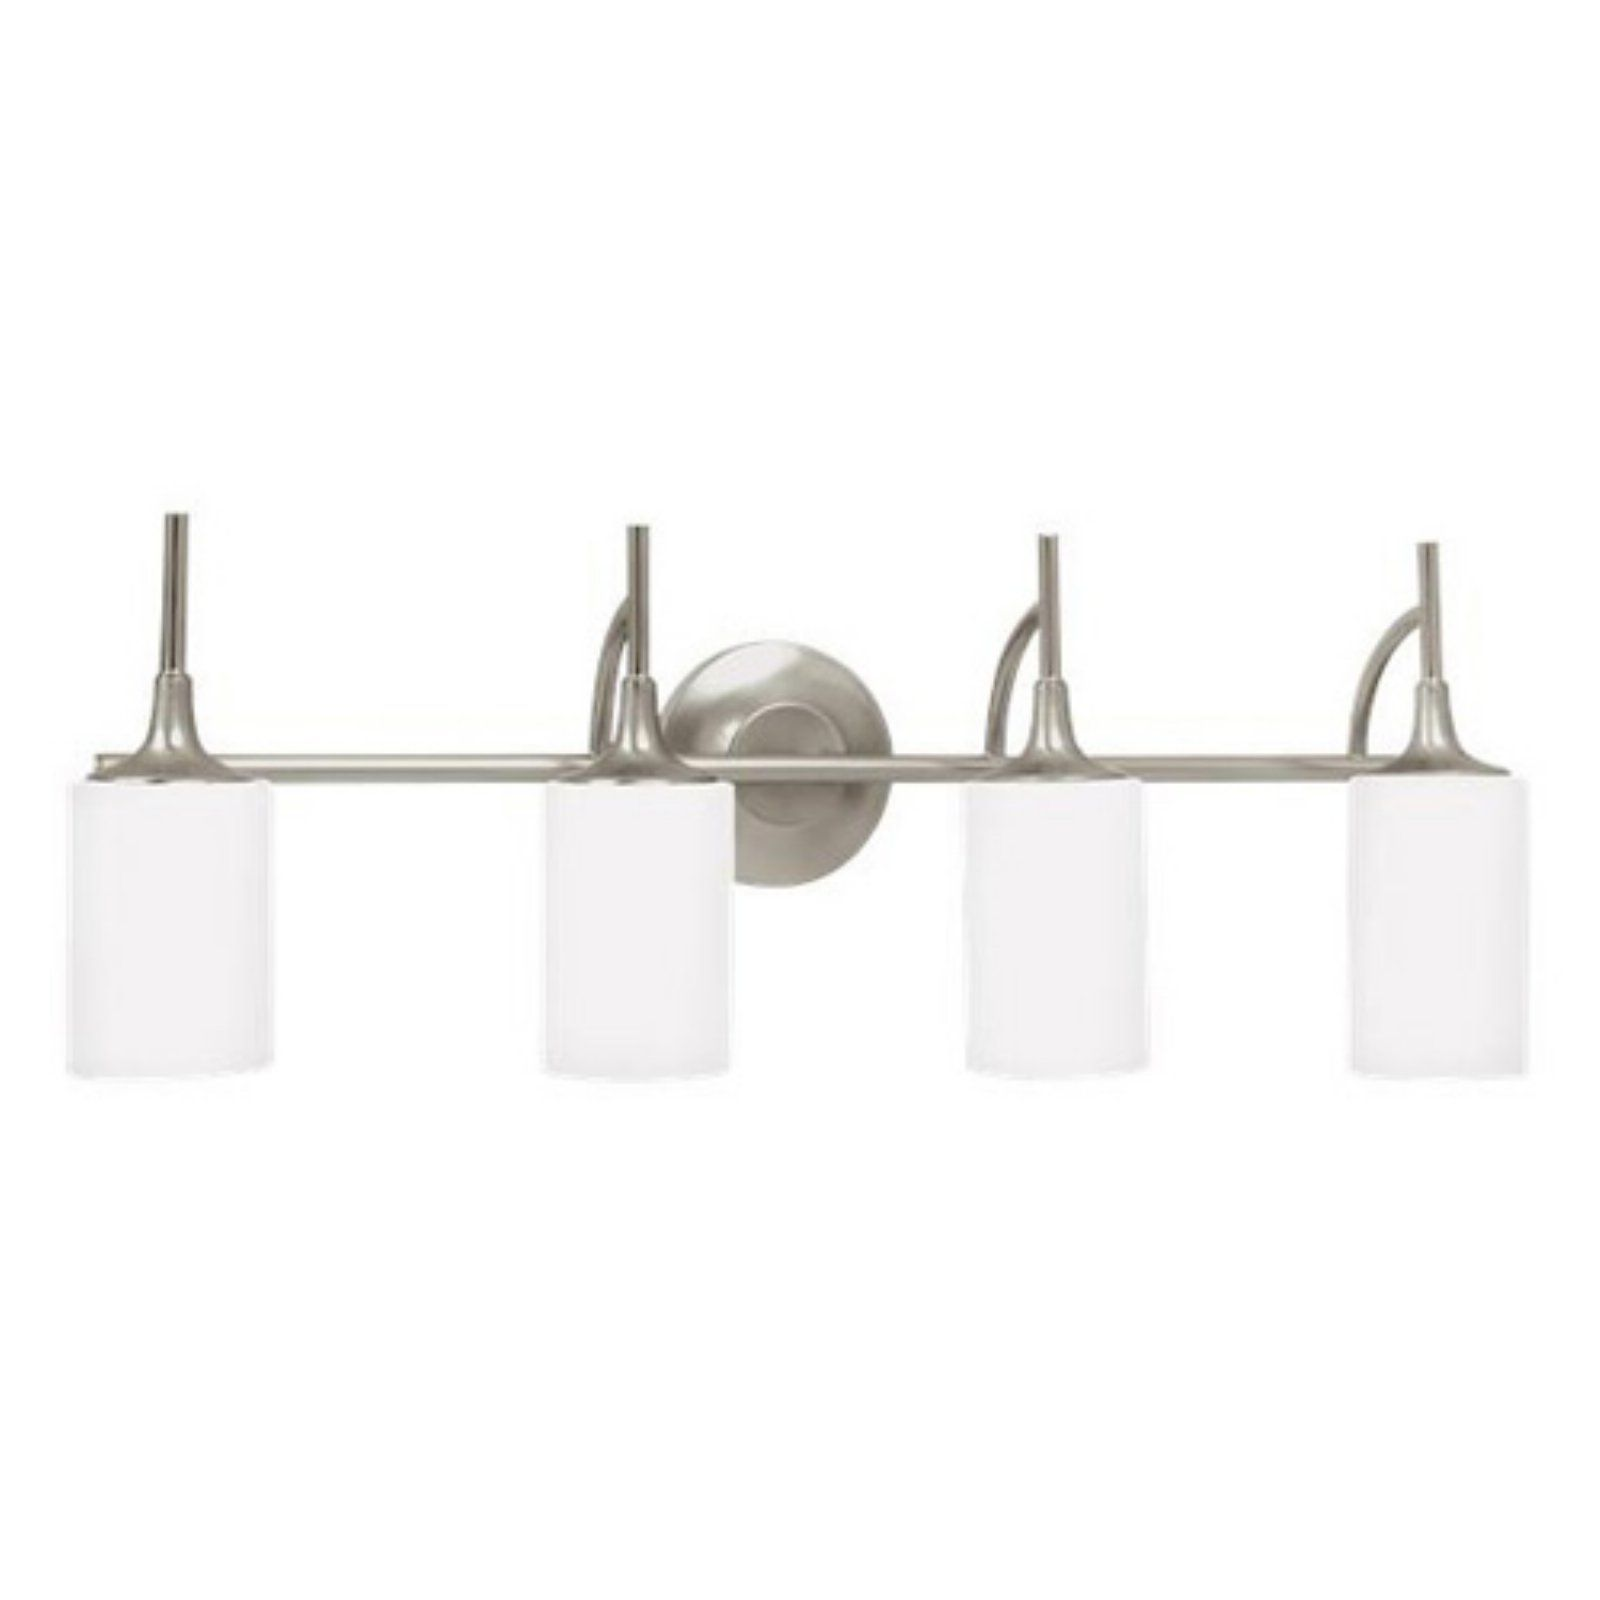 Photo of Sea Gull Lighting Stirling 44955EN3 Bathroom Vanity Light